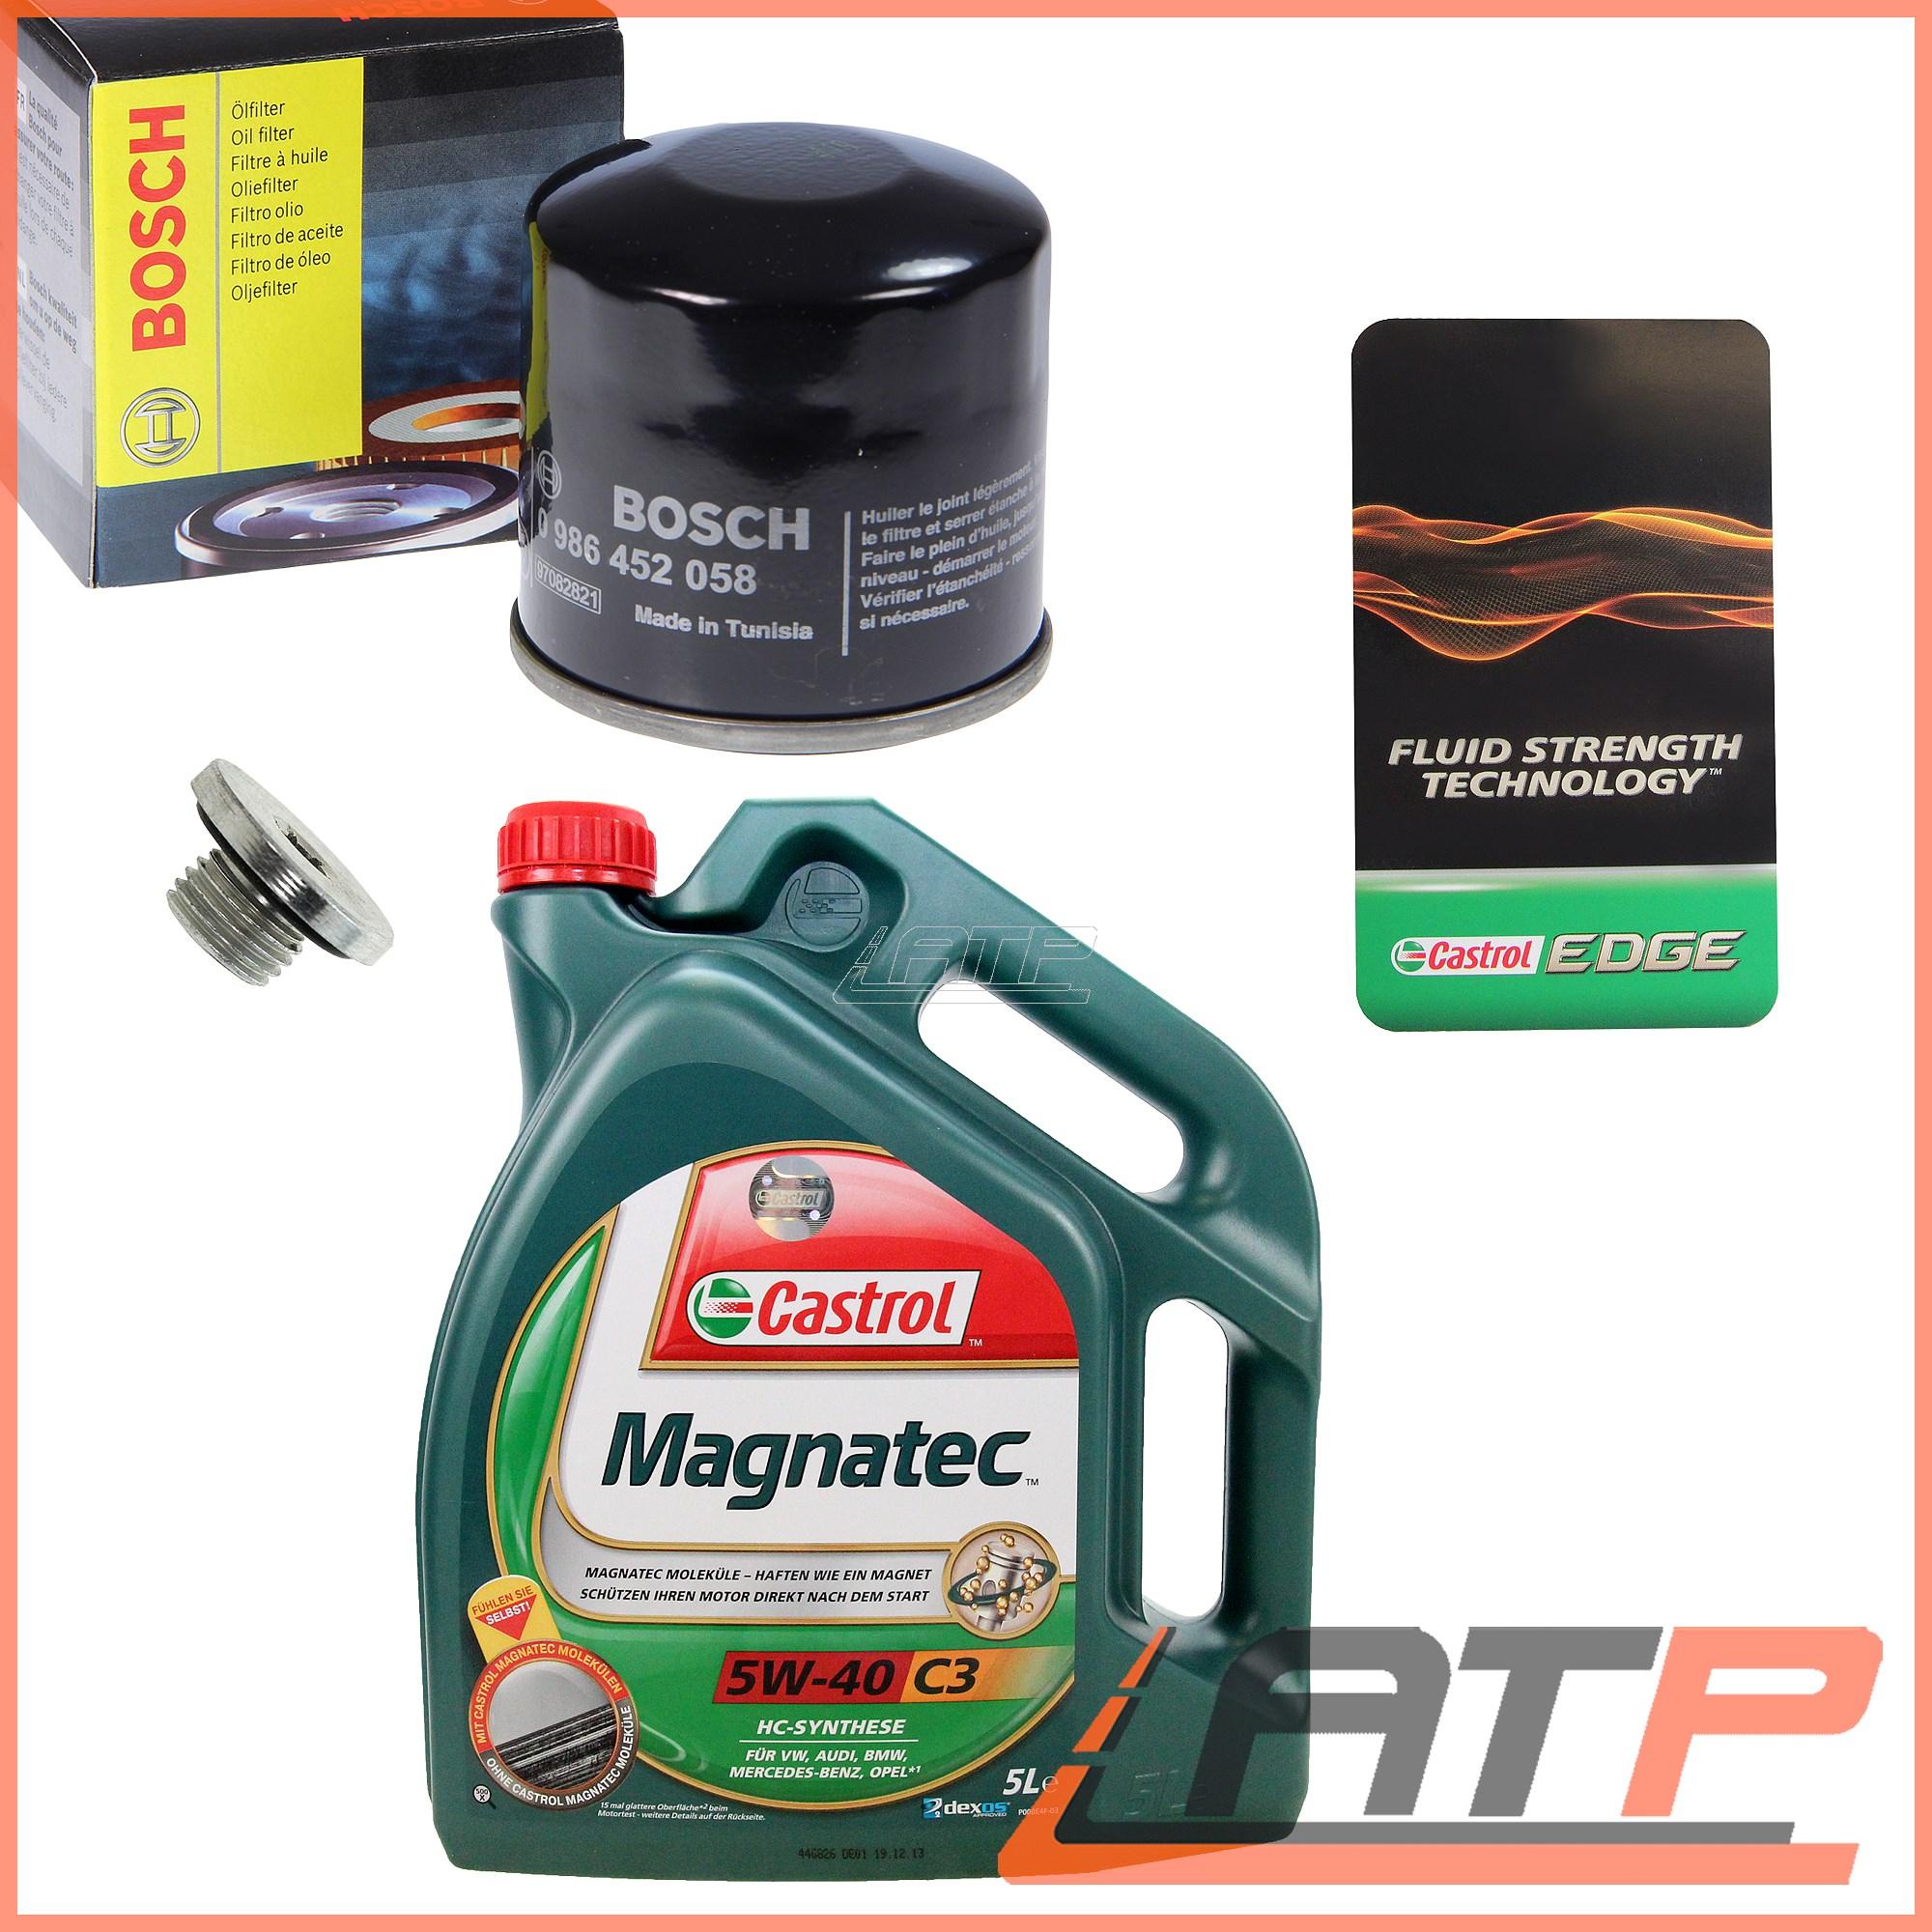 BOSCH OIL FILTER + 5L CASTROL MAGNATEC 5W-40 C3 SUZUKI SWIFT MK 4